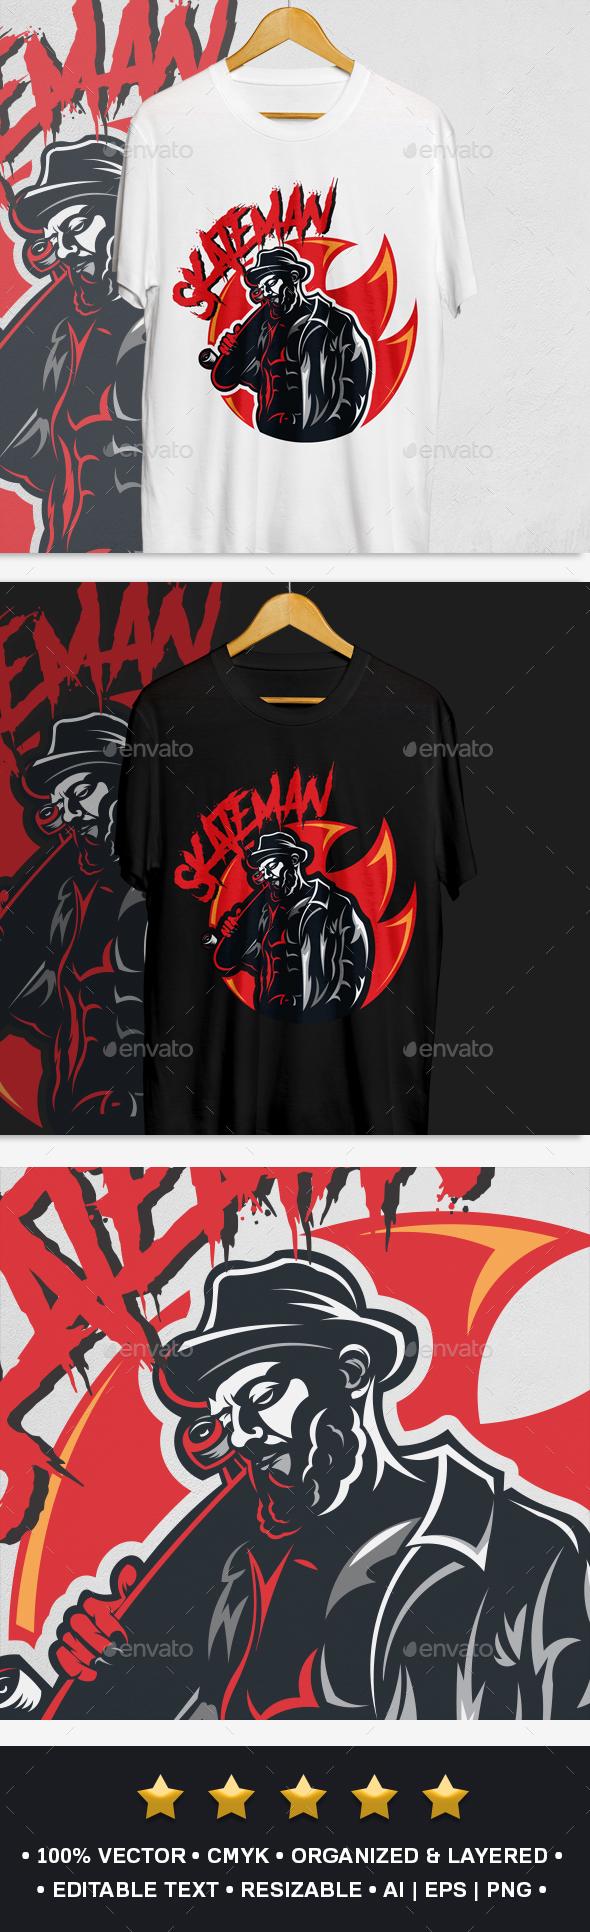 Skateboarder T-Shirt Design - Designs T-Shirts